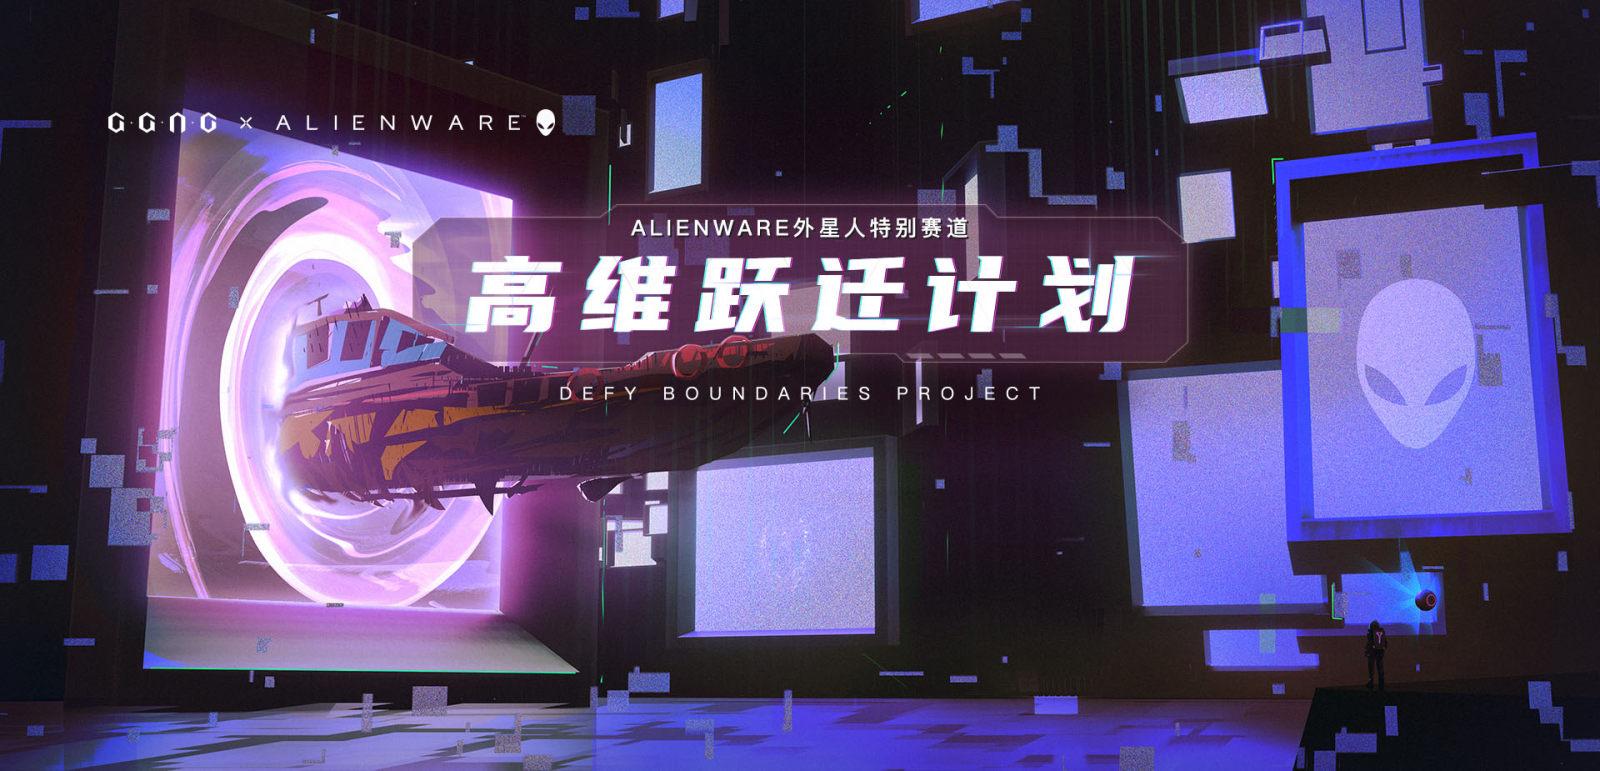 "GGAC X ALIENWARE  外星人""高维跃迁计划""特别赛道启动"